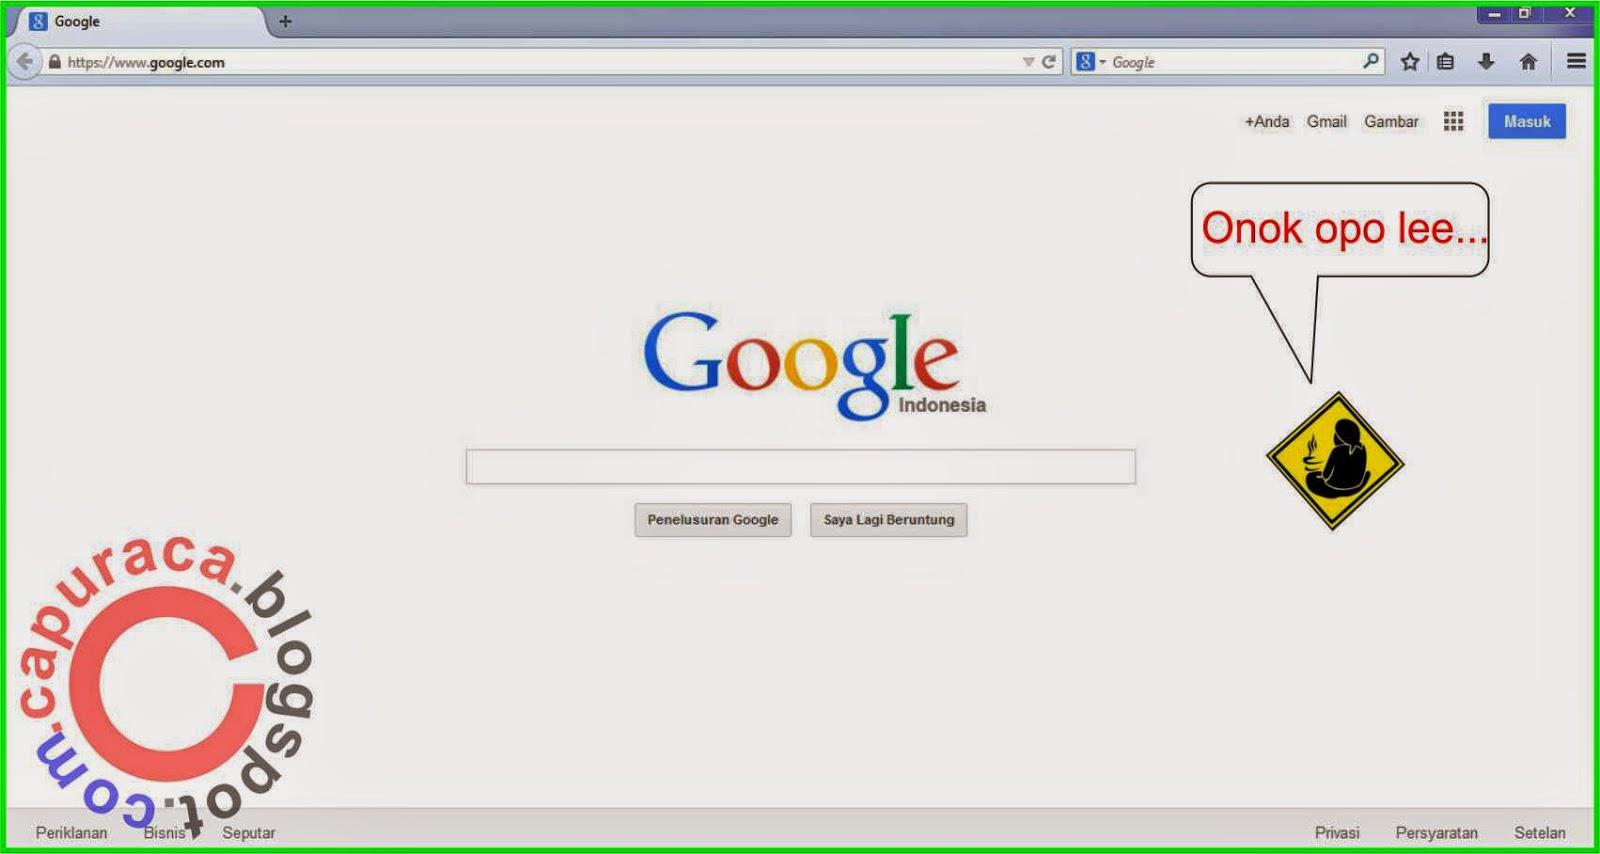 Misteri mbah google, halaman depan google